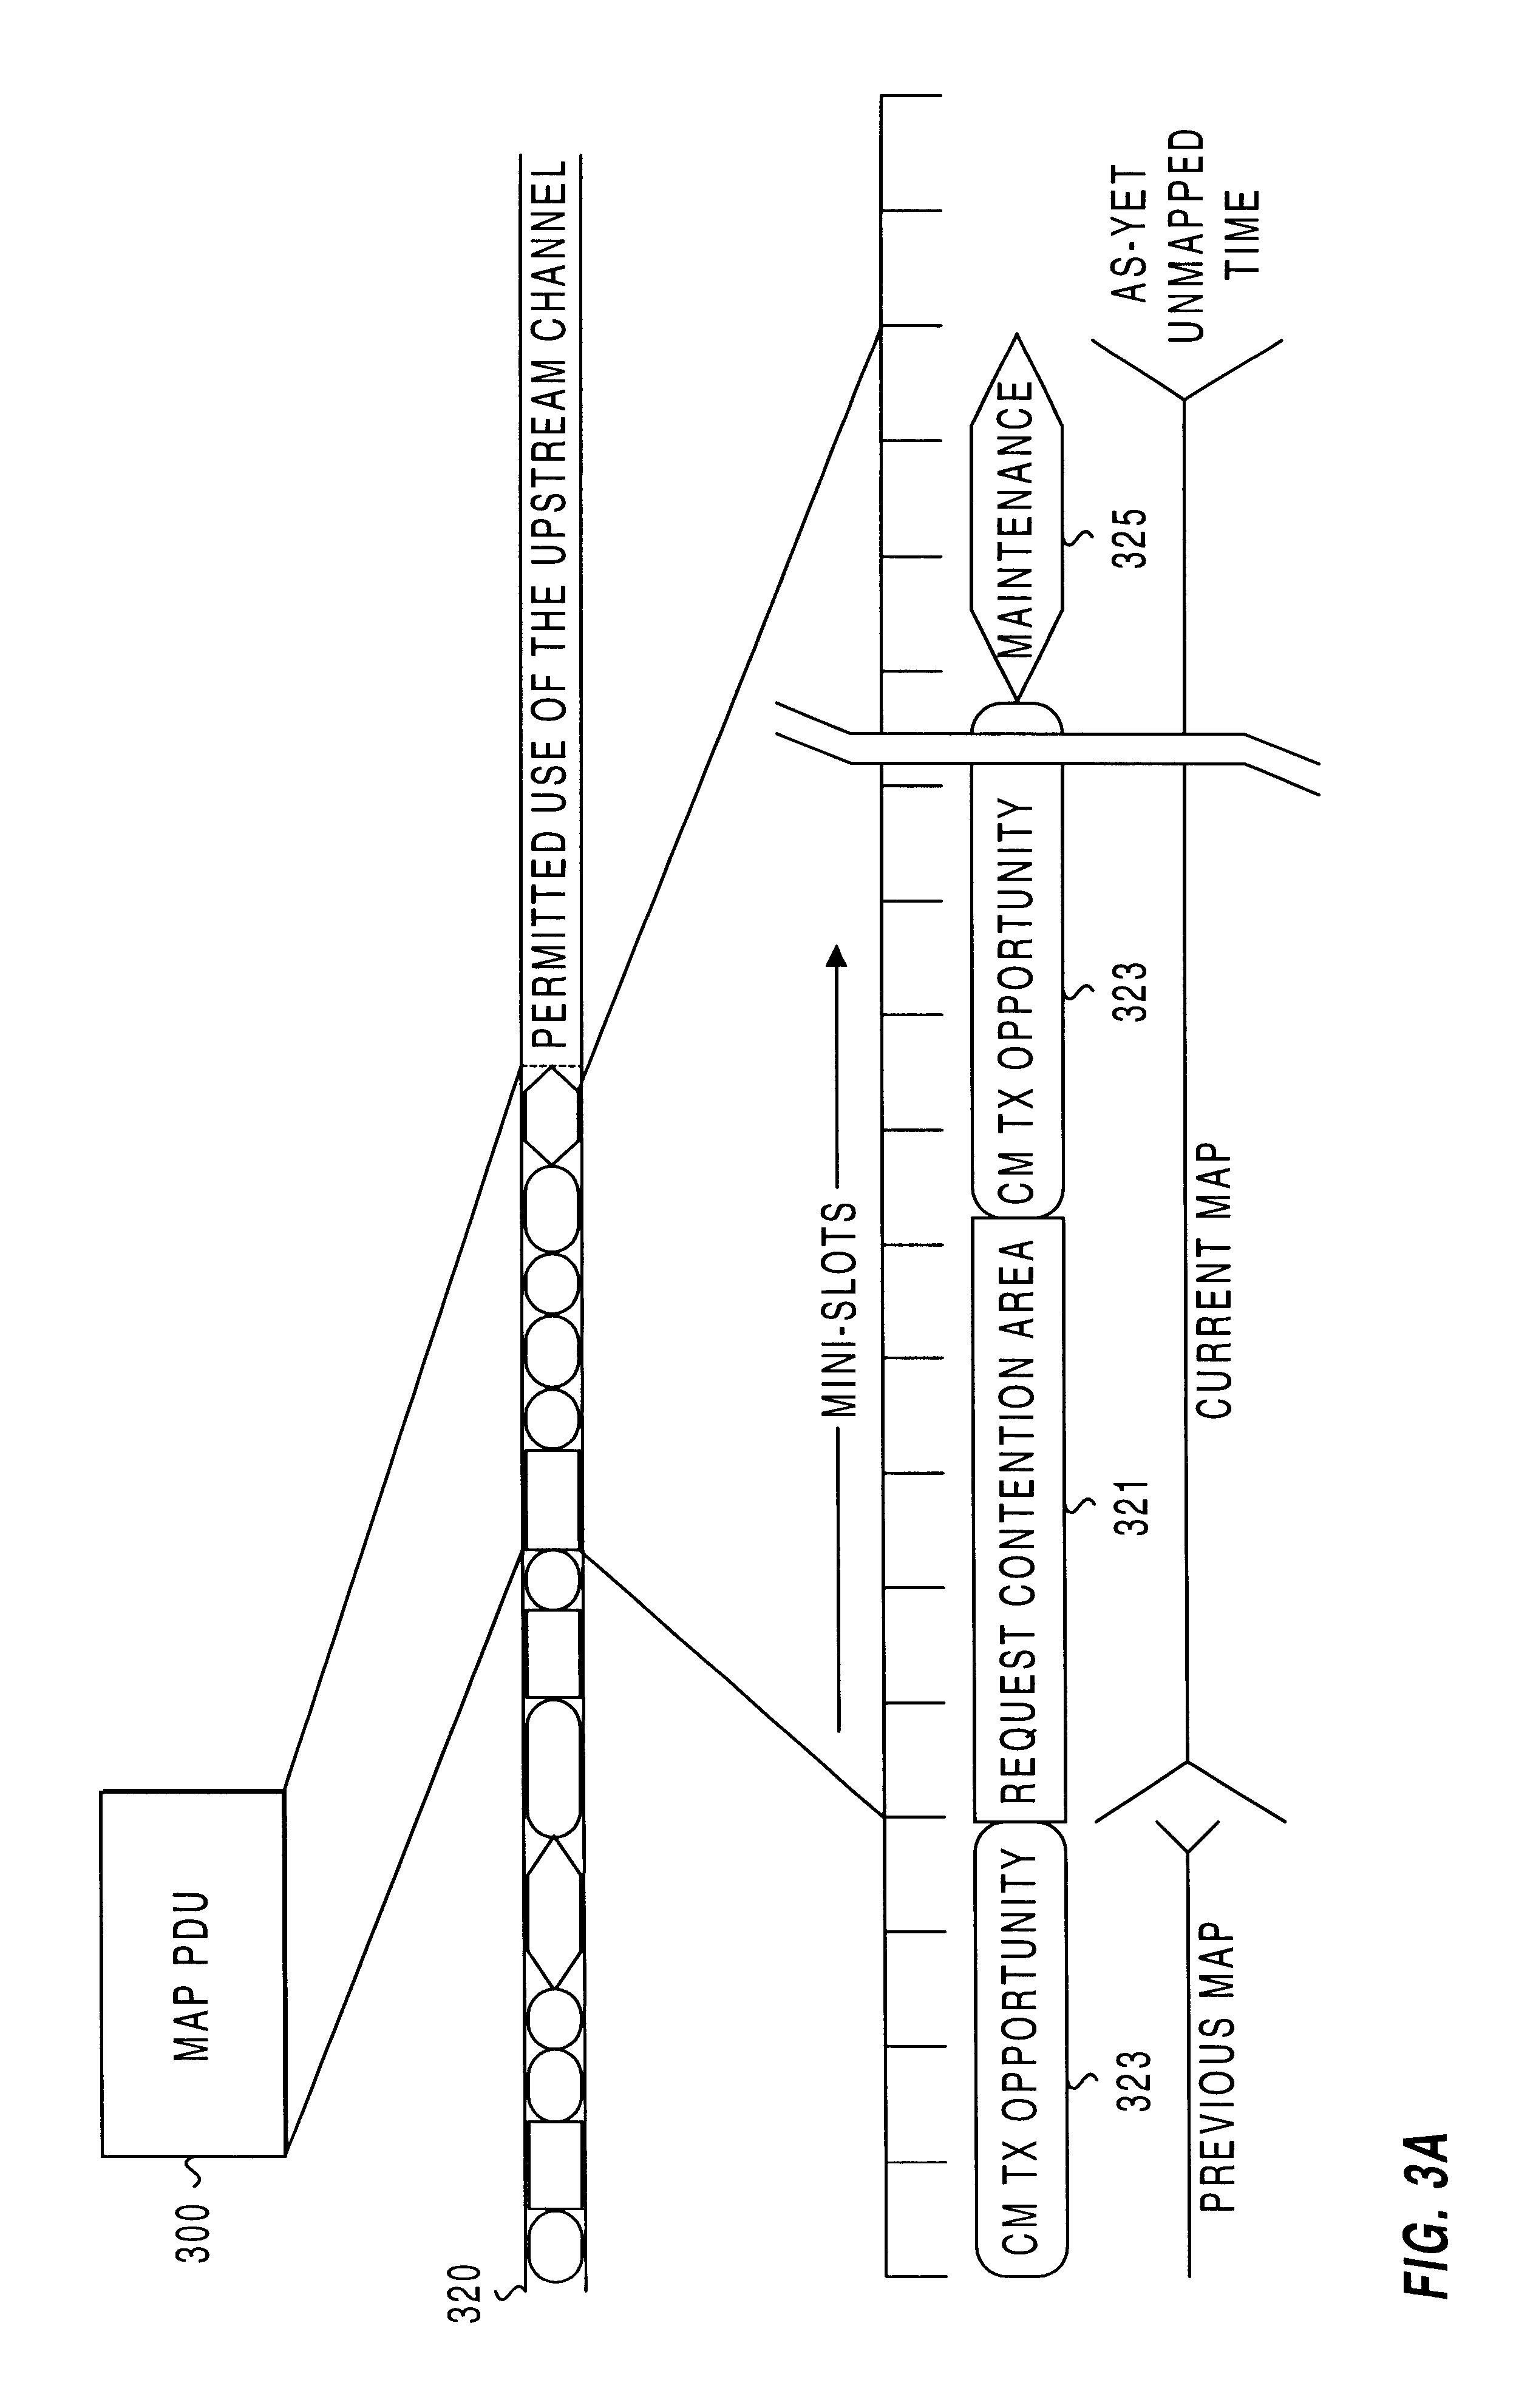 Patent Us 6728887 B1 Hybrid Fiber Coax Hfc Definition And Diagram